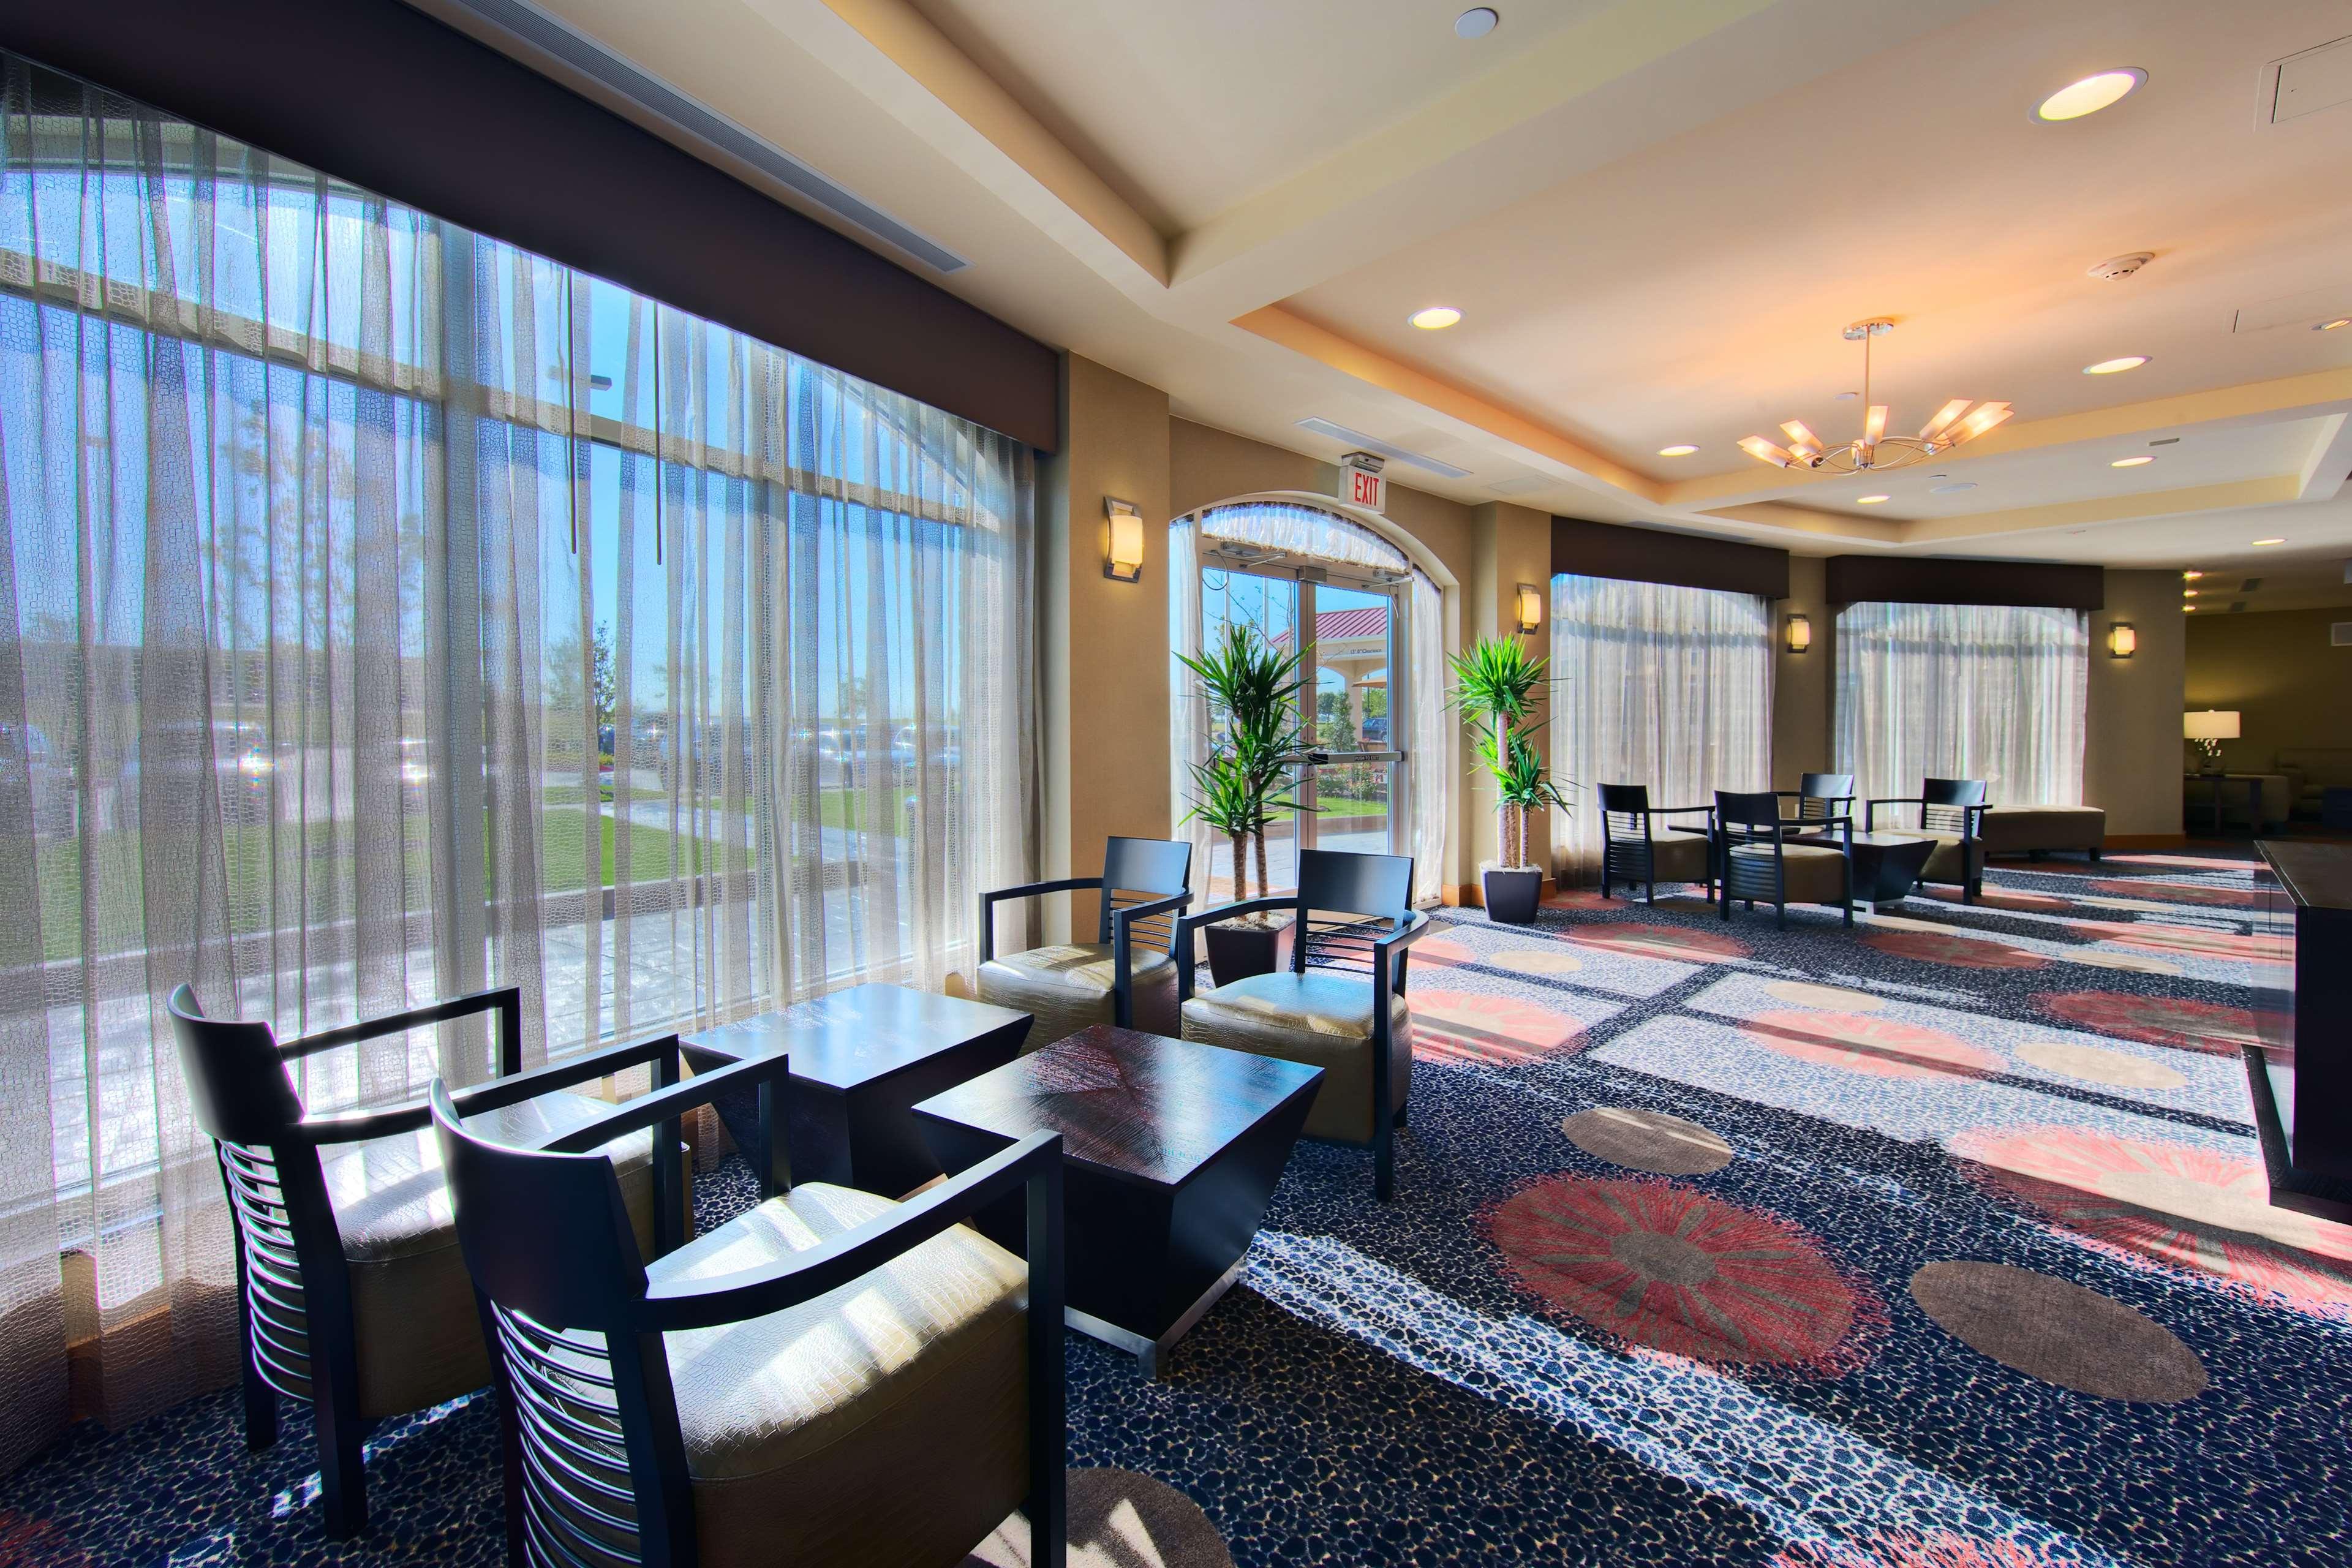 Hilton Garden Inn DFW North Grapevine image 5